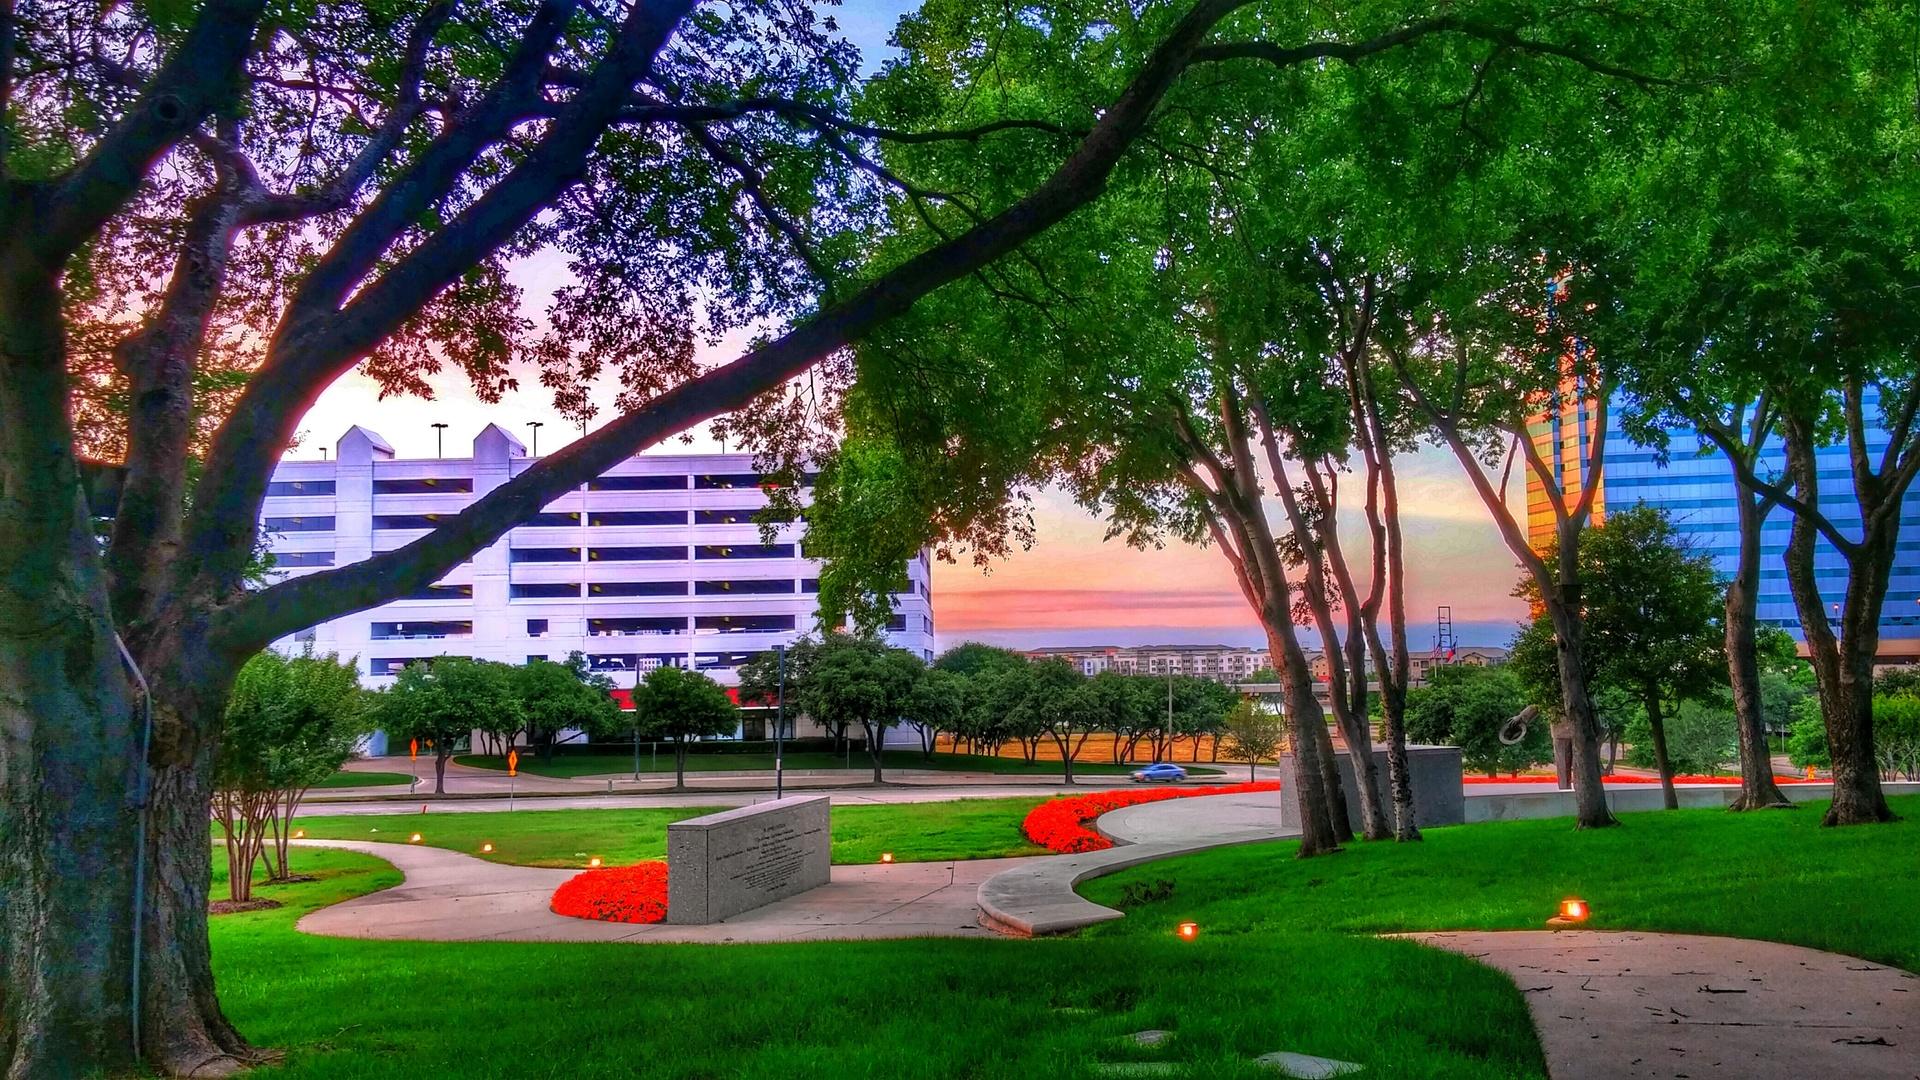 Ben Carpenter Park   jim.olive.54, sunset, trees, buildings